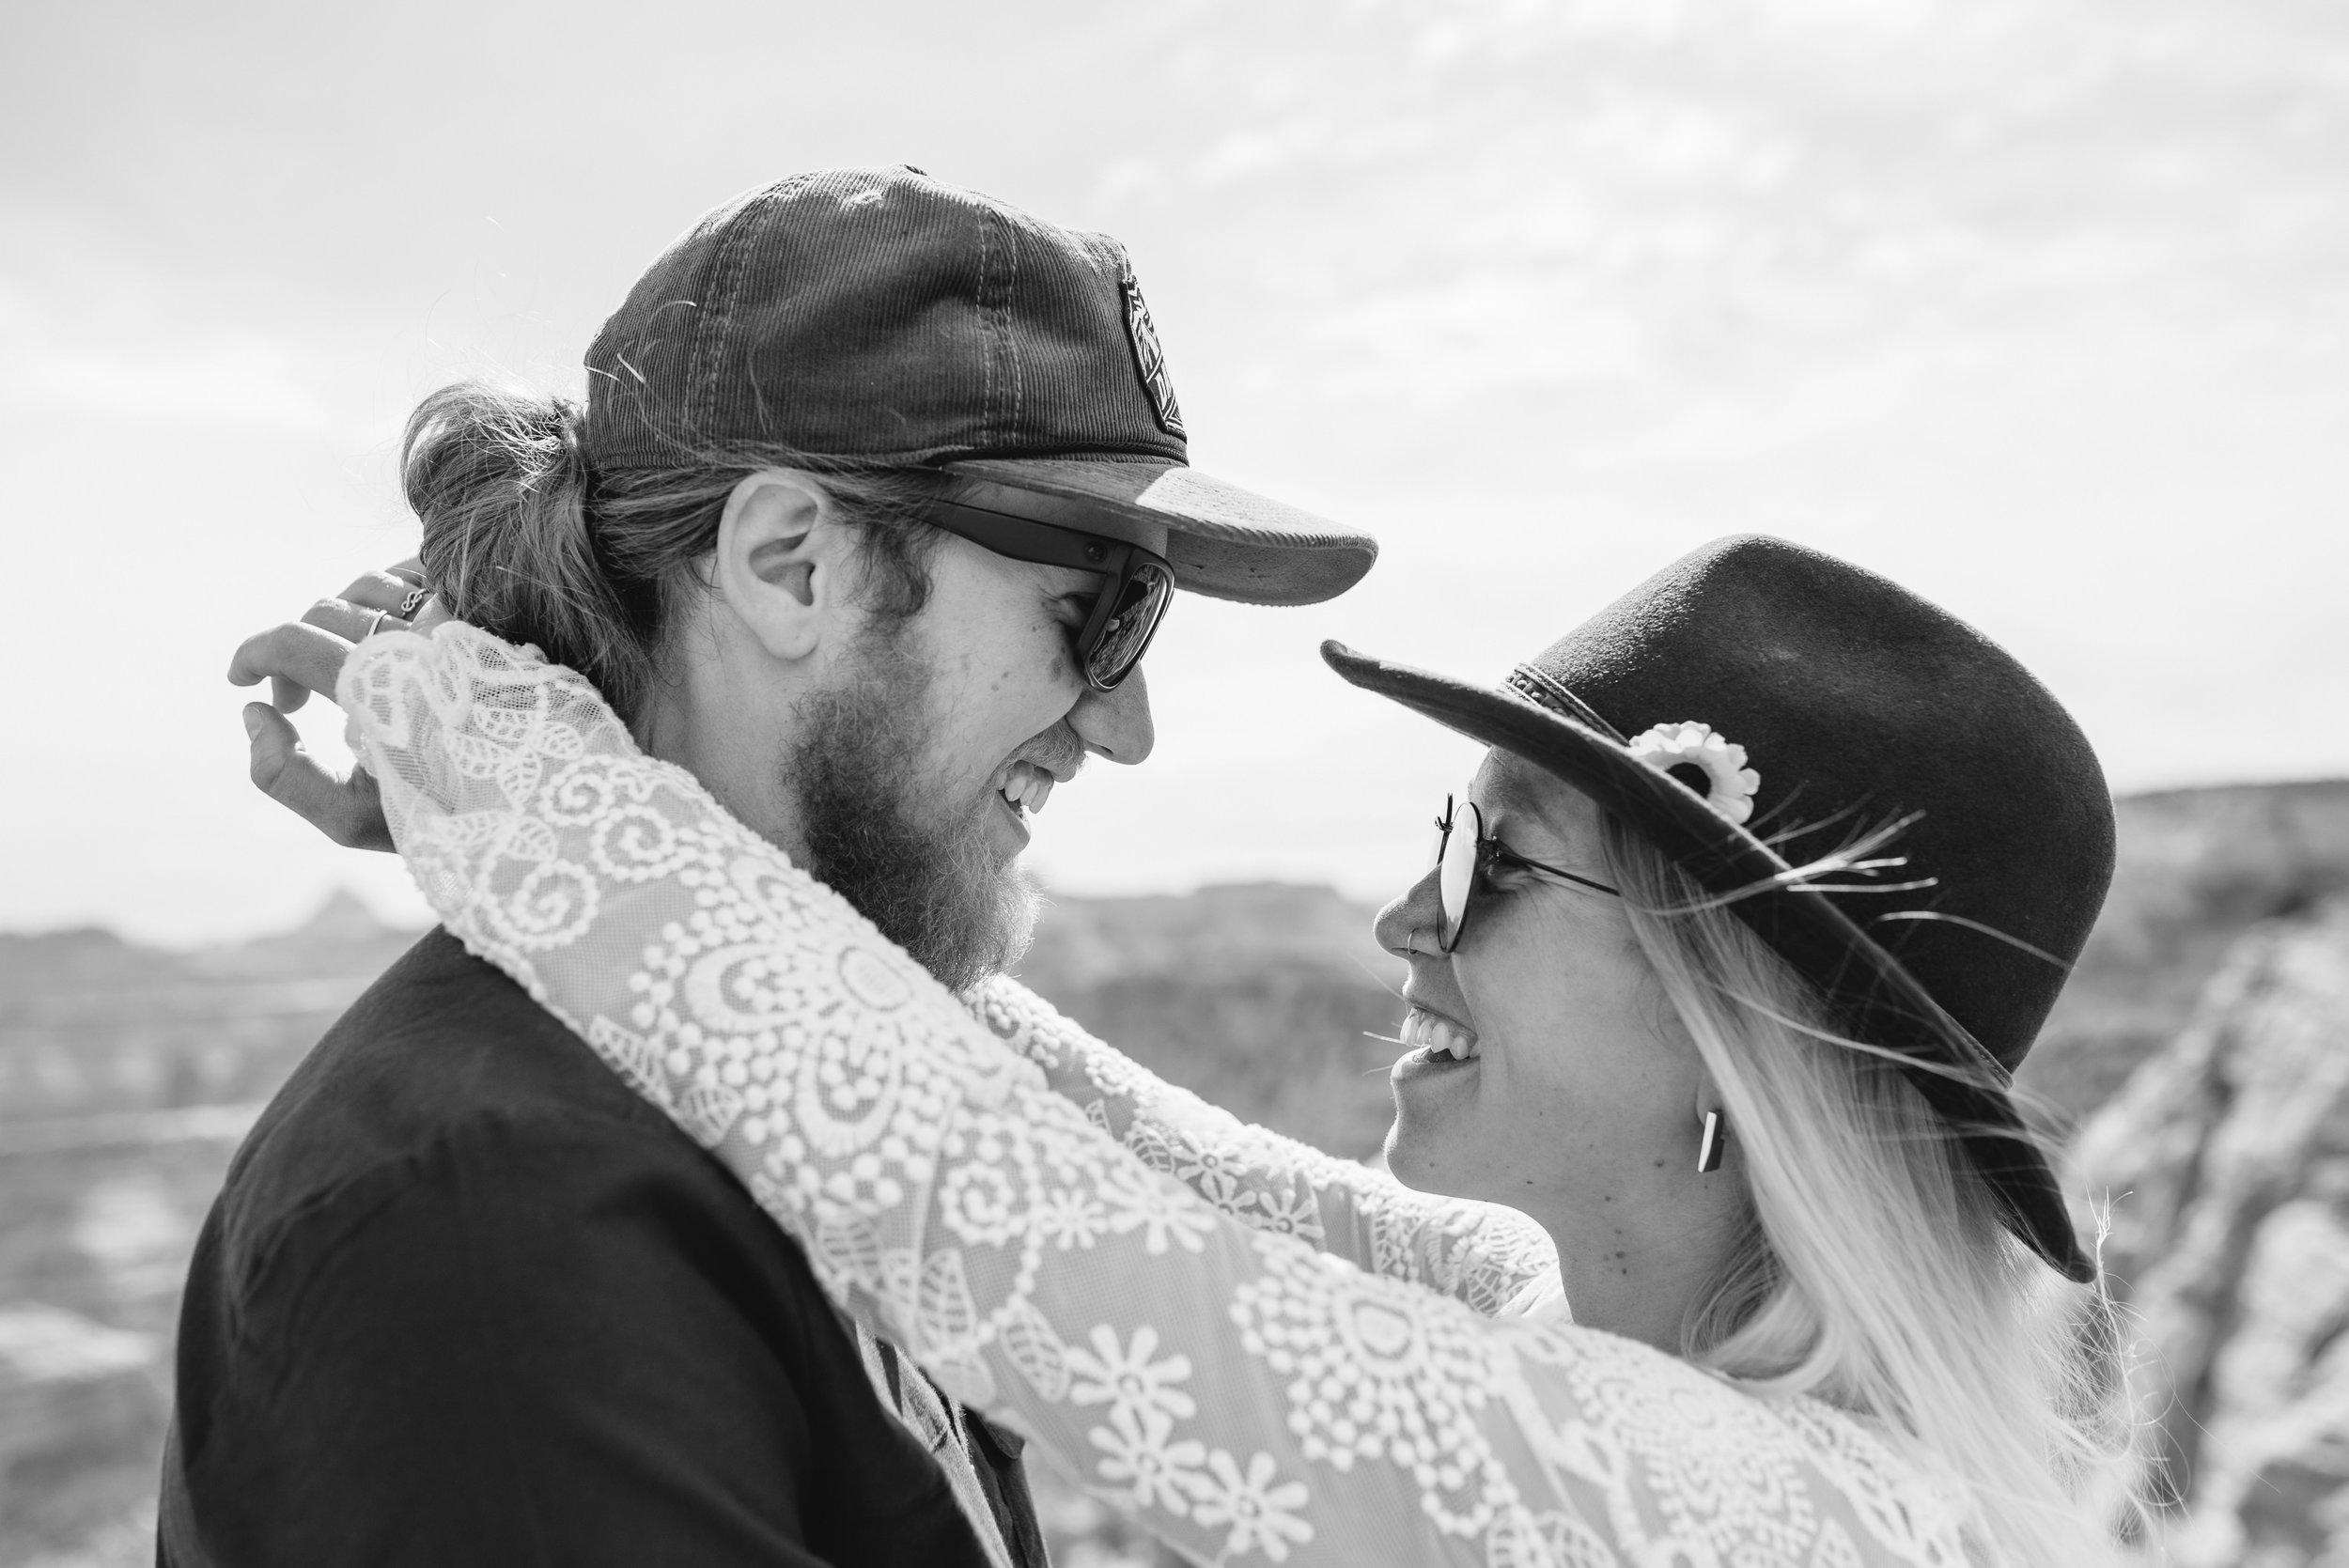 Trevor Hooper Photo Park City Wedding Photographer. Engagement Session.